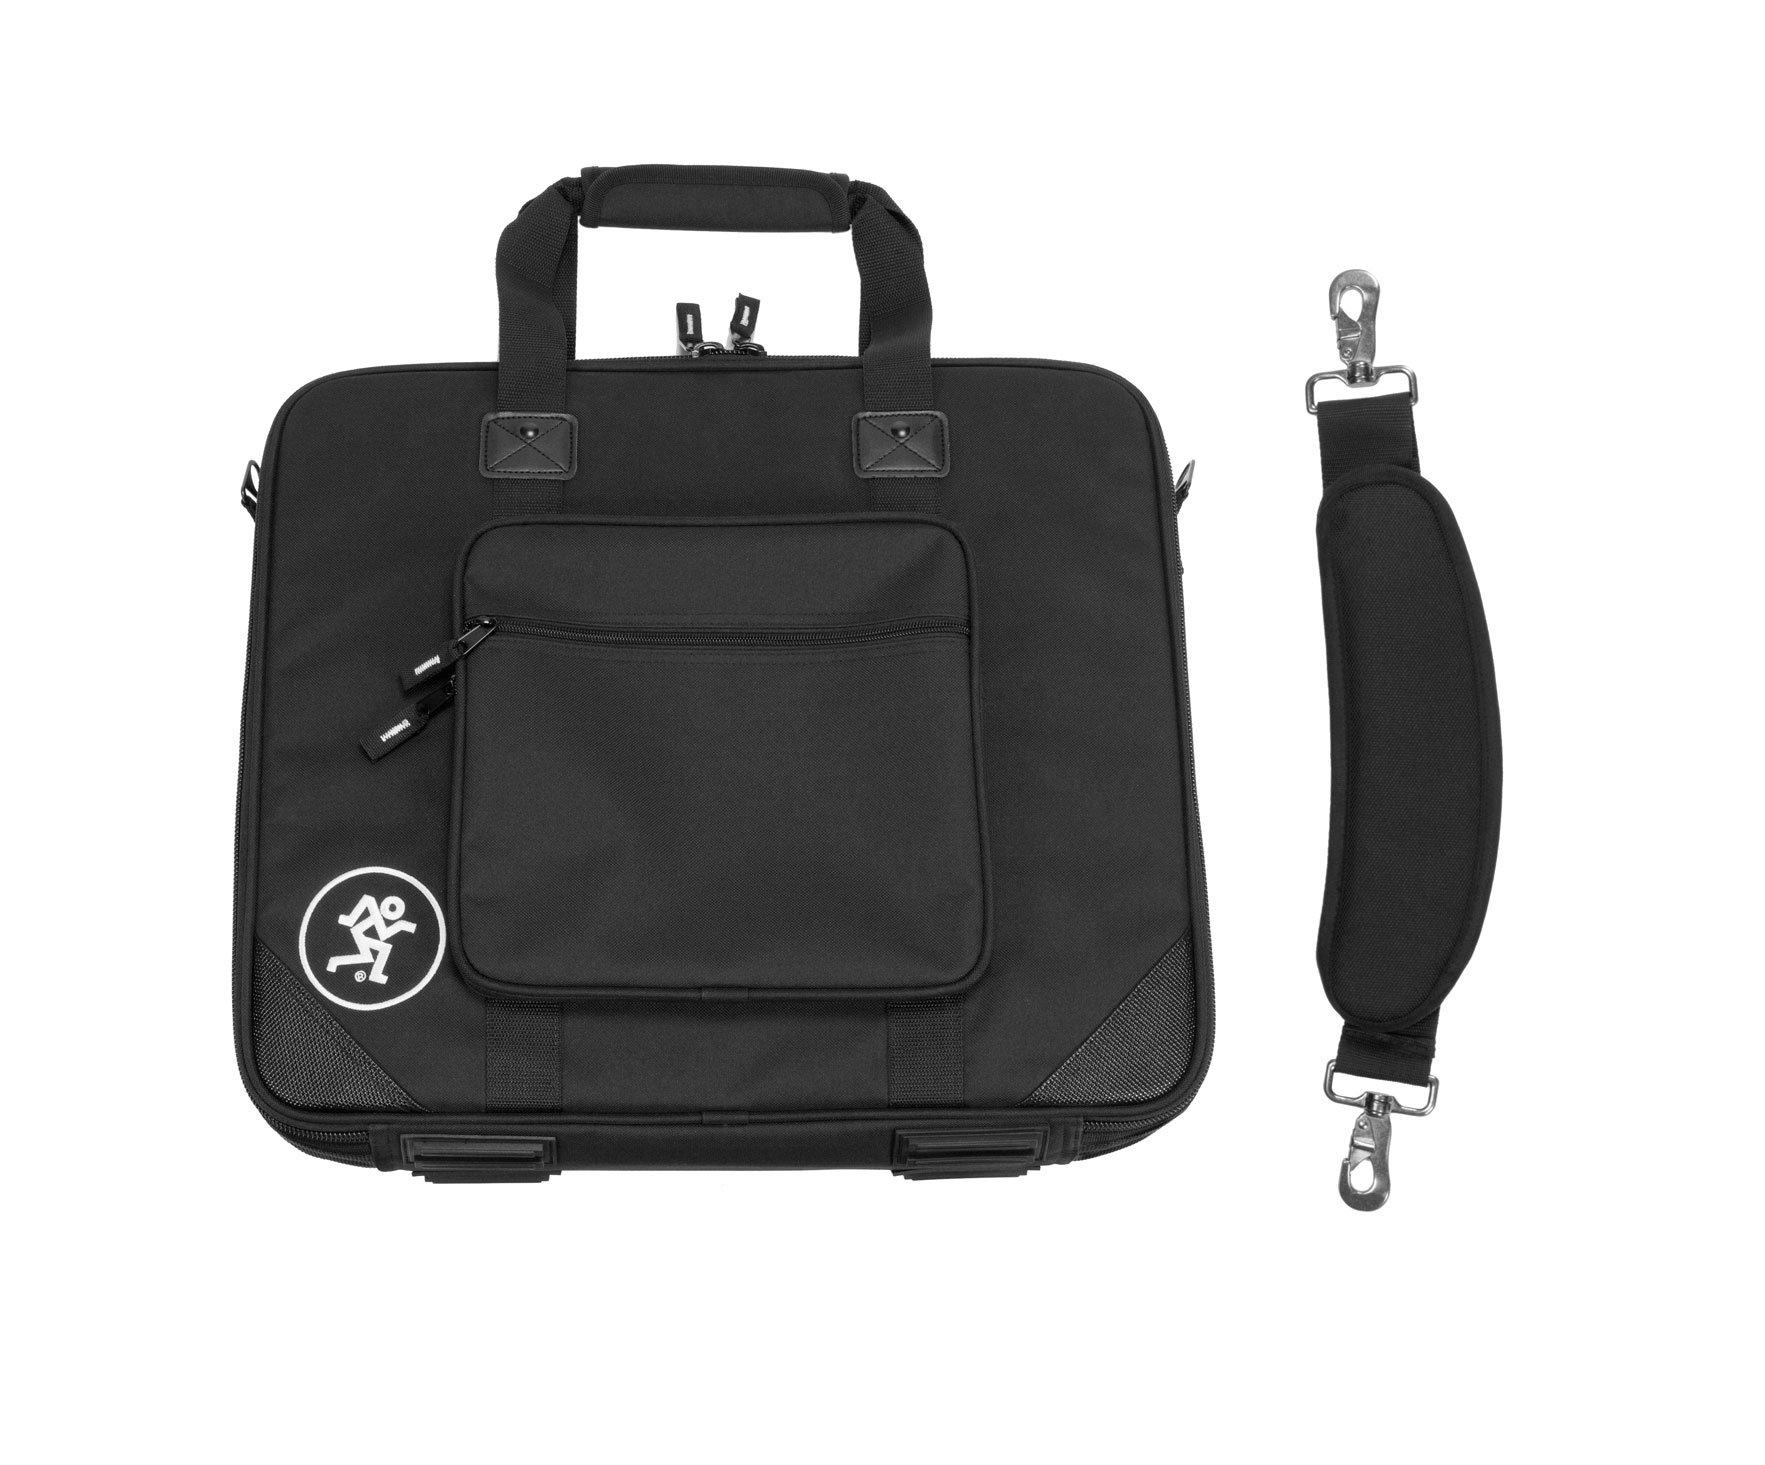 Mackie Mixer Bag for ProFX22 (ProFX22 Bag)